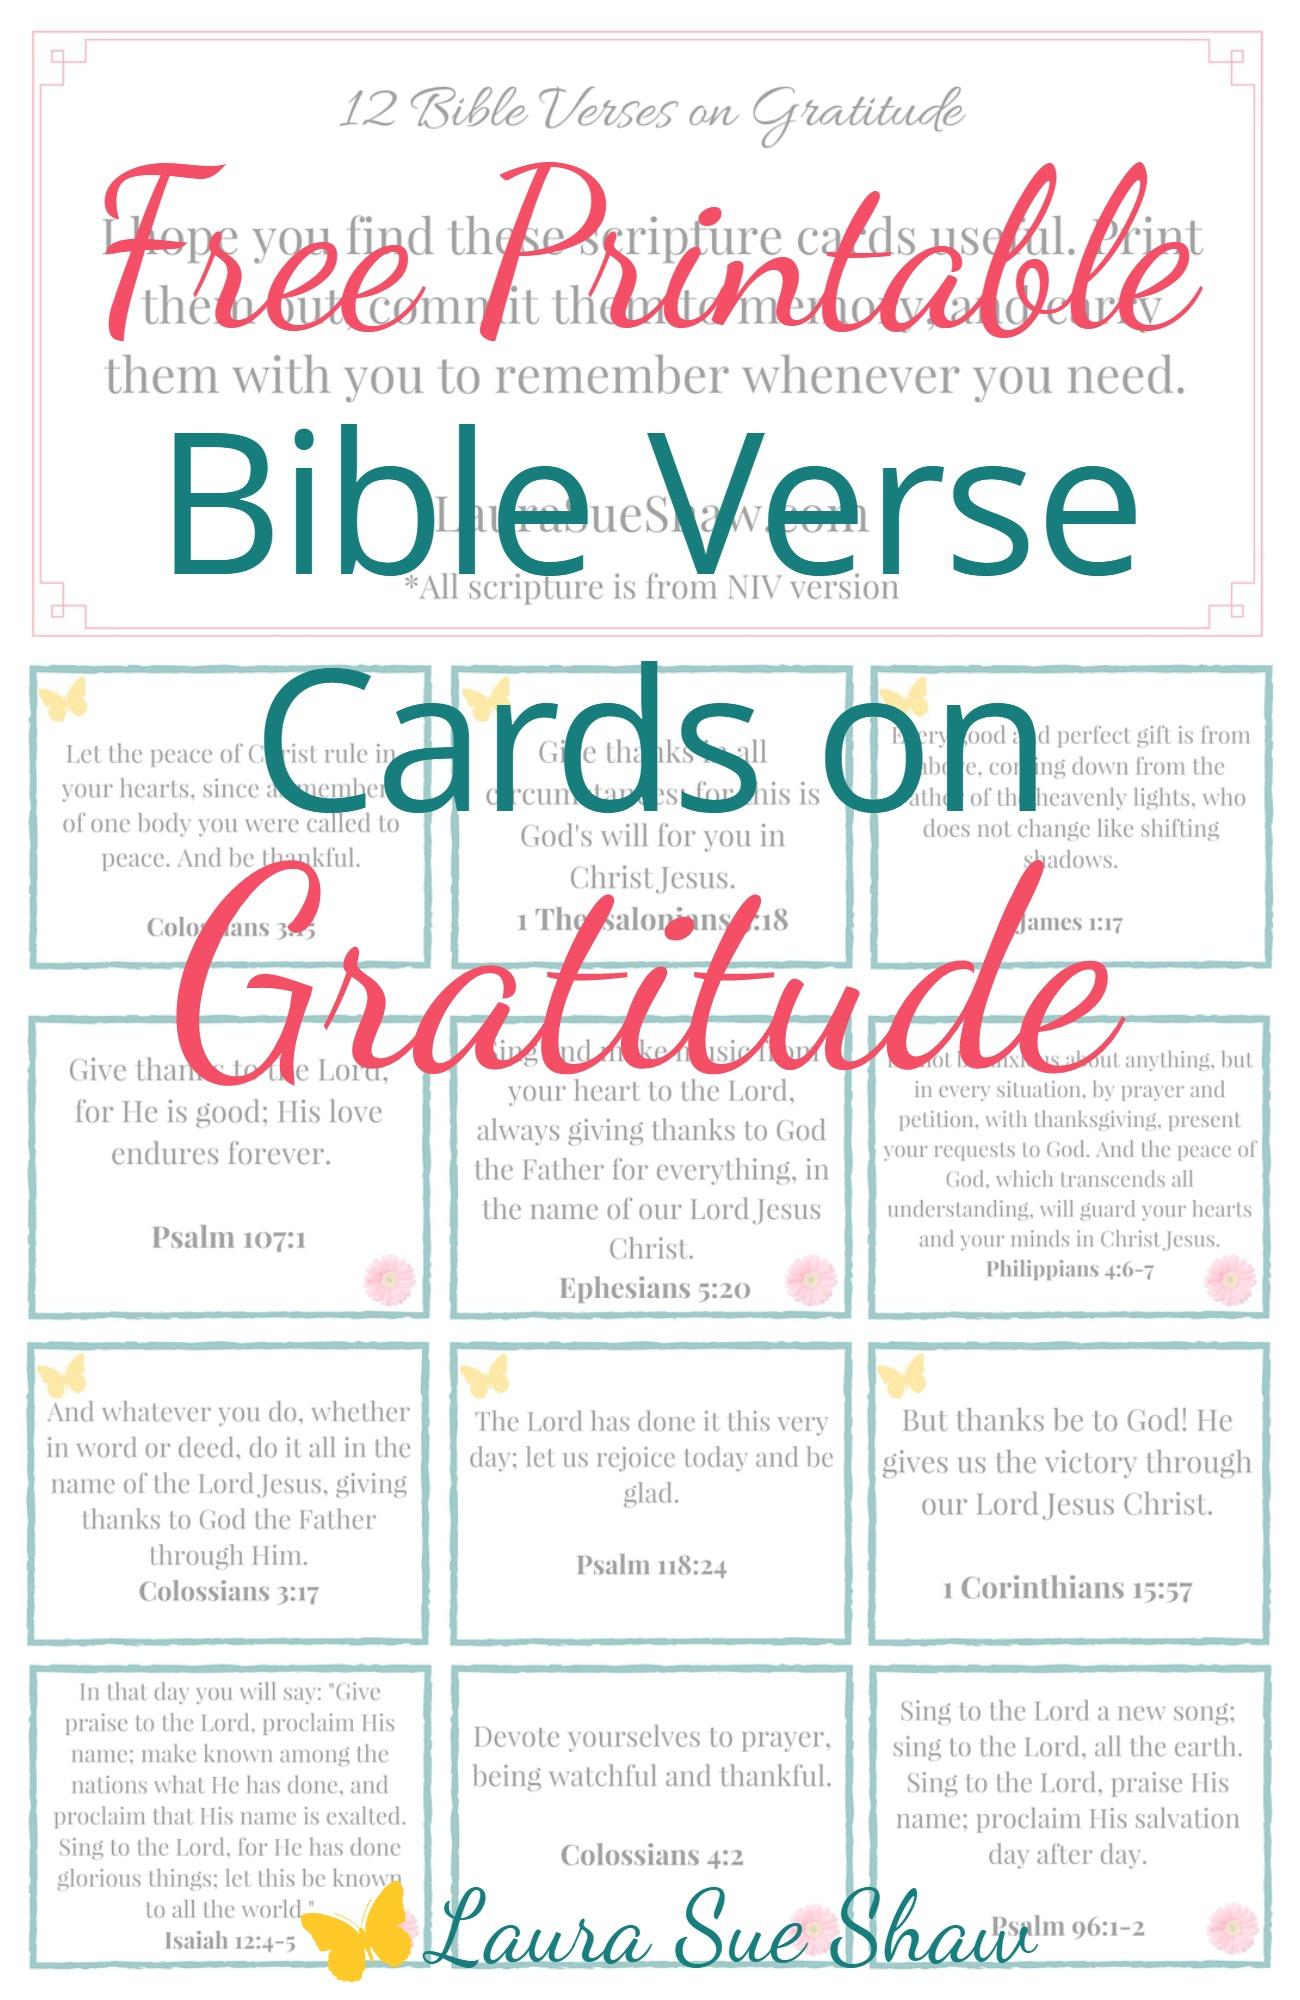 Free Printable Bible Verse Cards On Gratitude